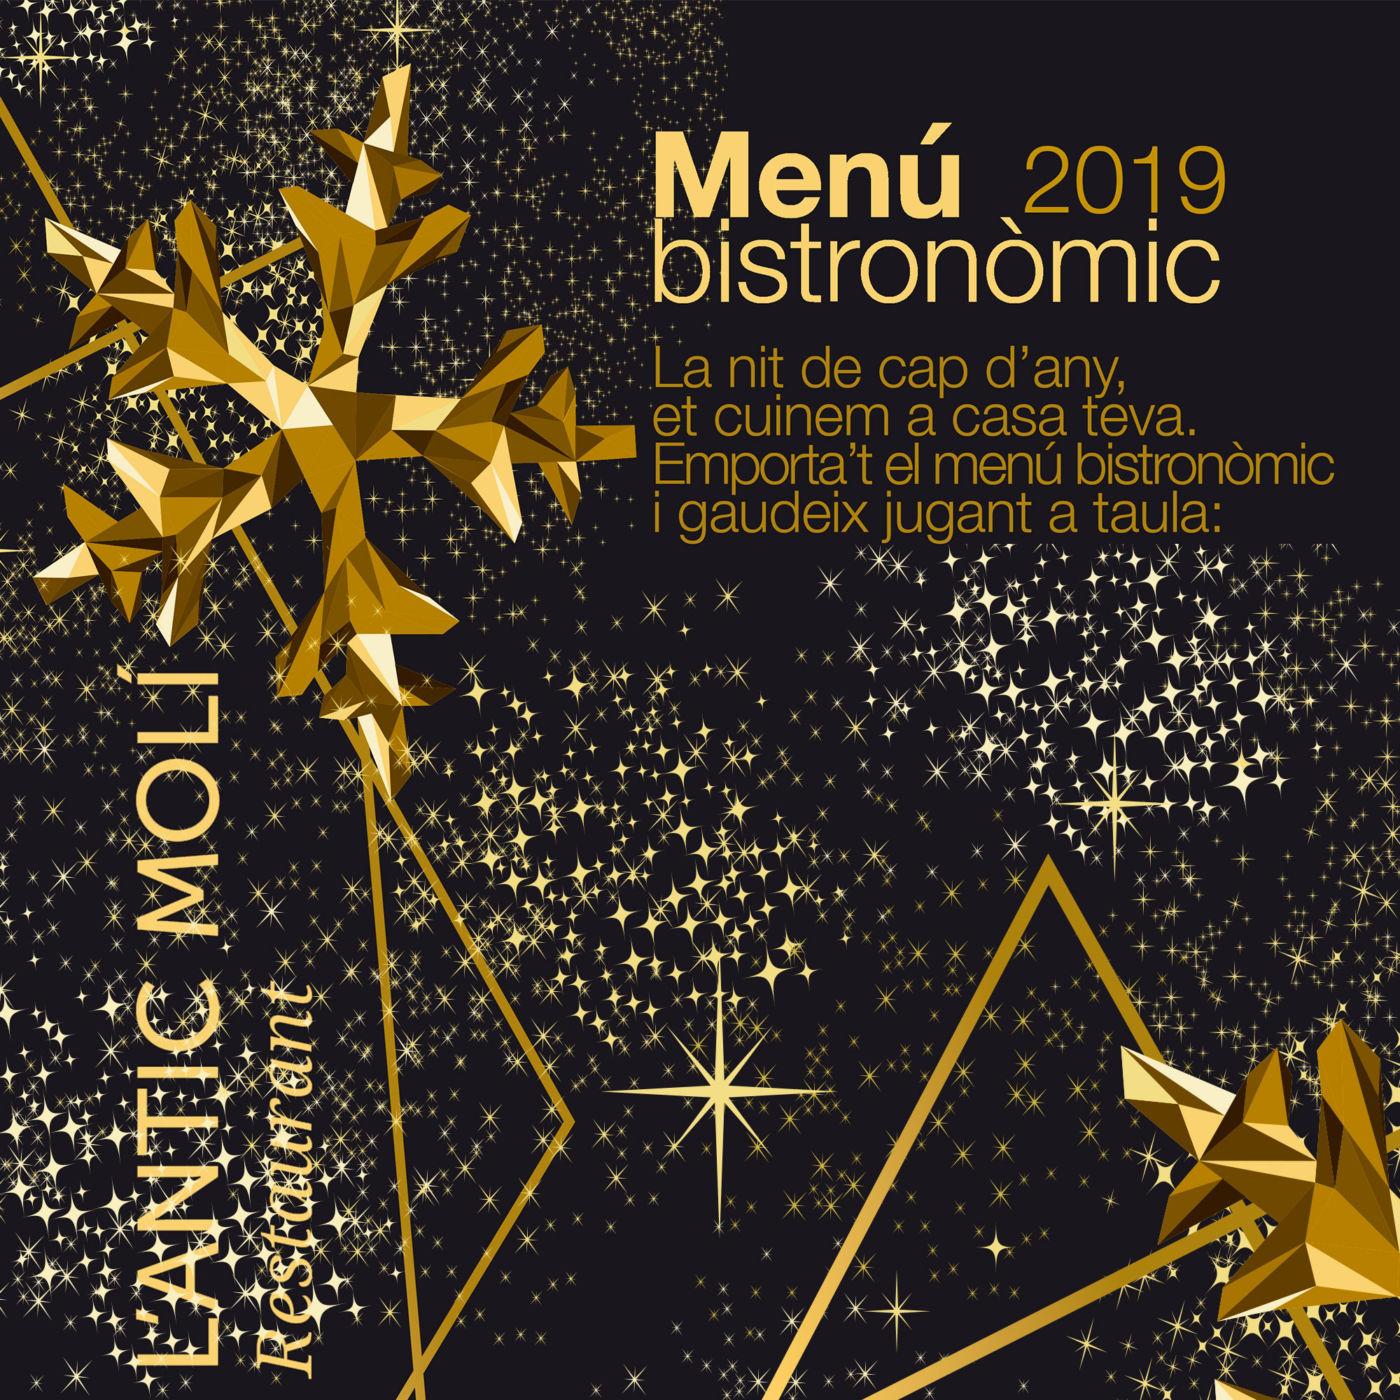 BISTRONOMIC-ANTIC-MOLI-2019